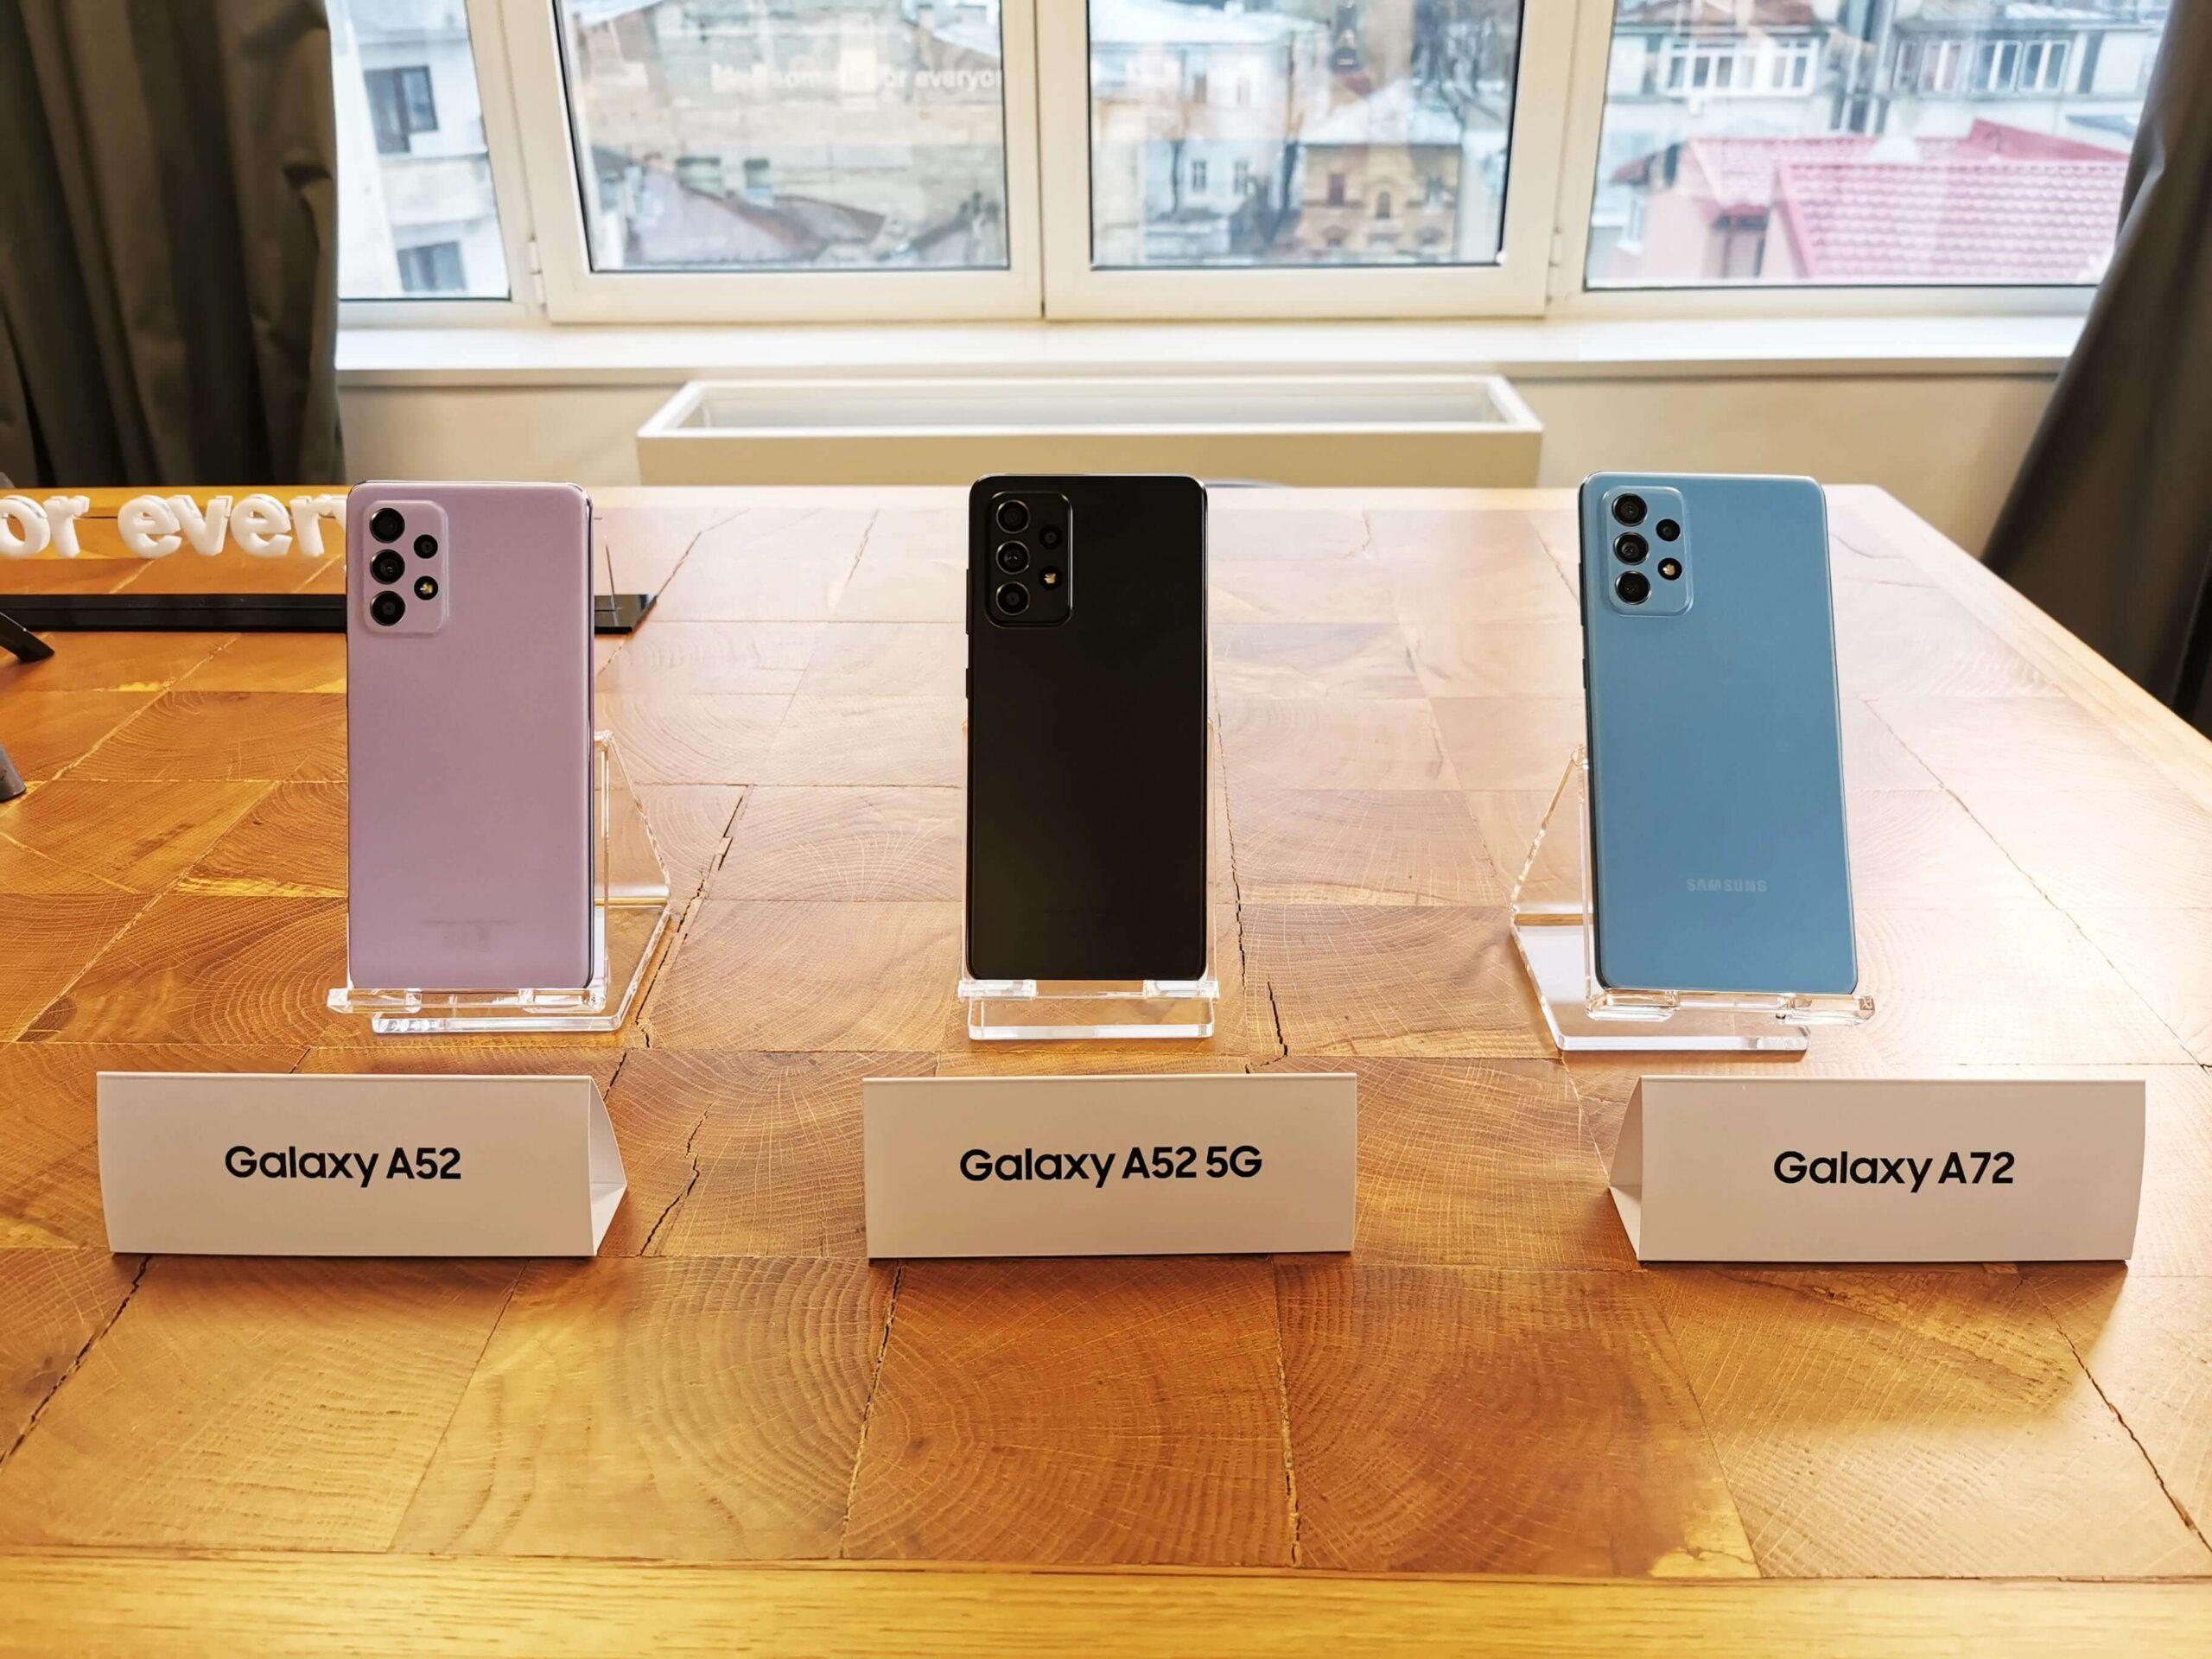 Primele impresii cu Samsung Galaxy A52, A52 5G și A72